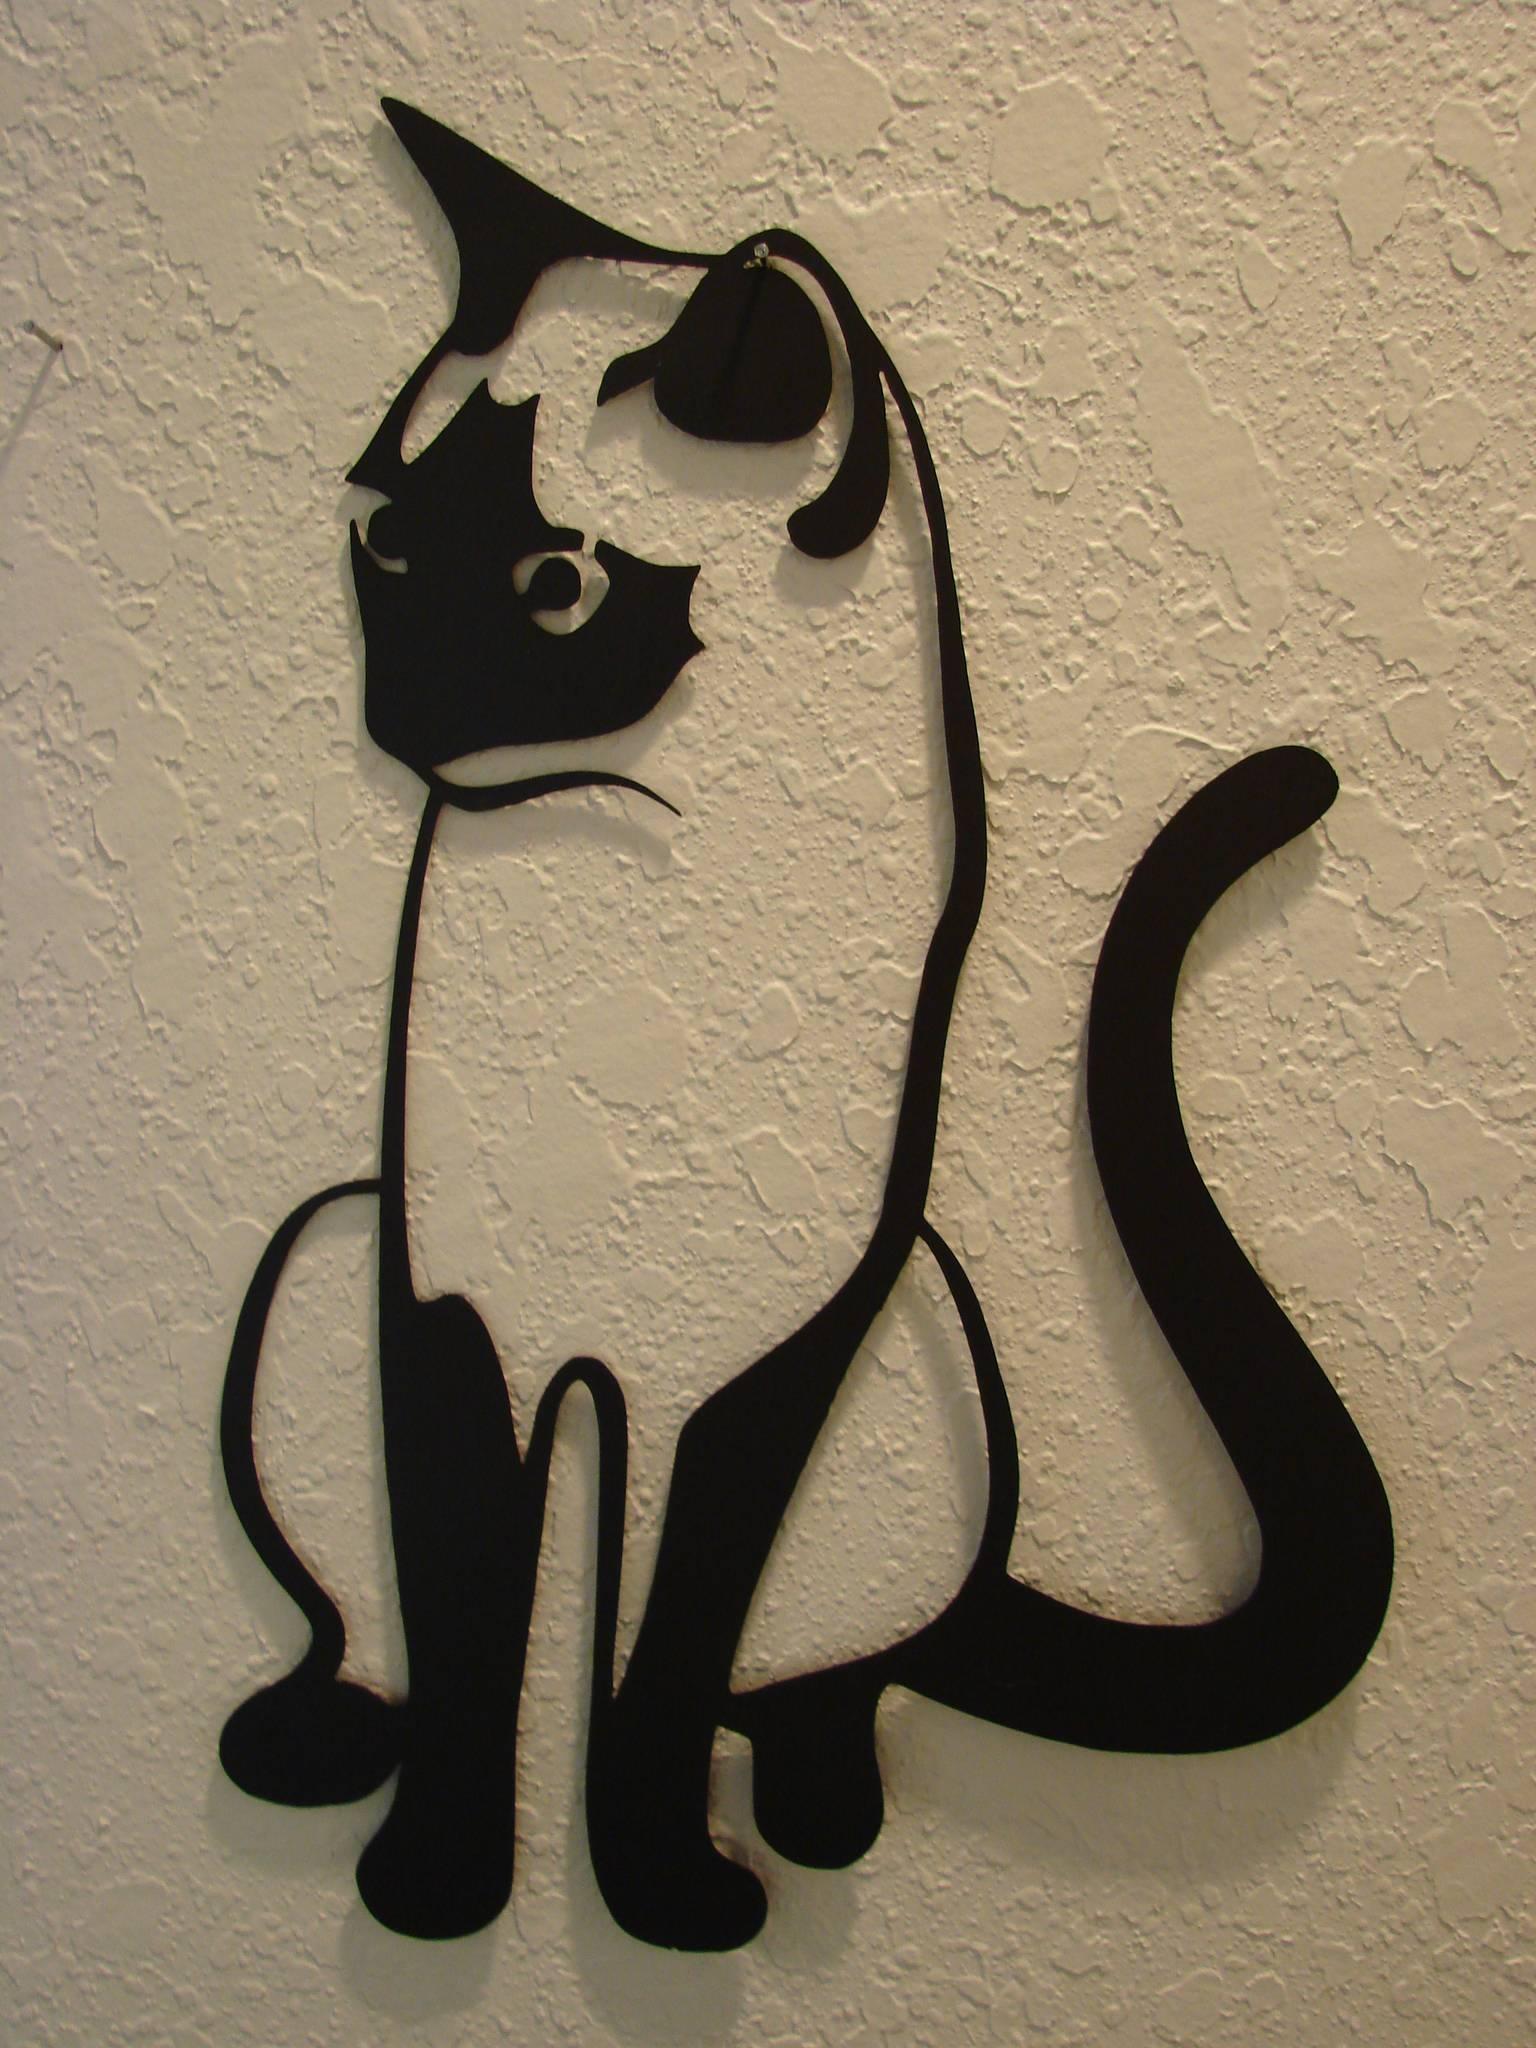 16 Gauge Plasma Cut Kitty Cat Metal Wall Art – : Intended For Most Popular Cat Metal Wall Art (View 2 of 20)